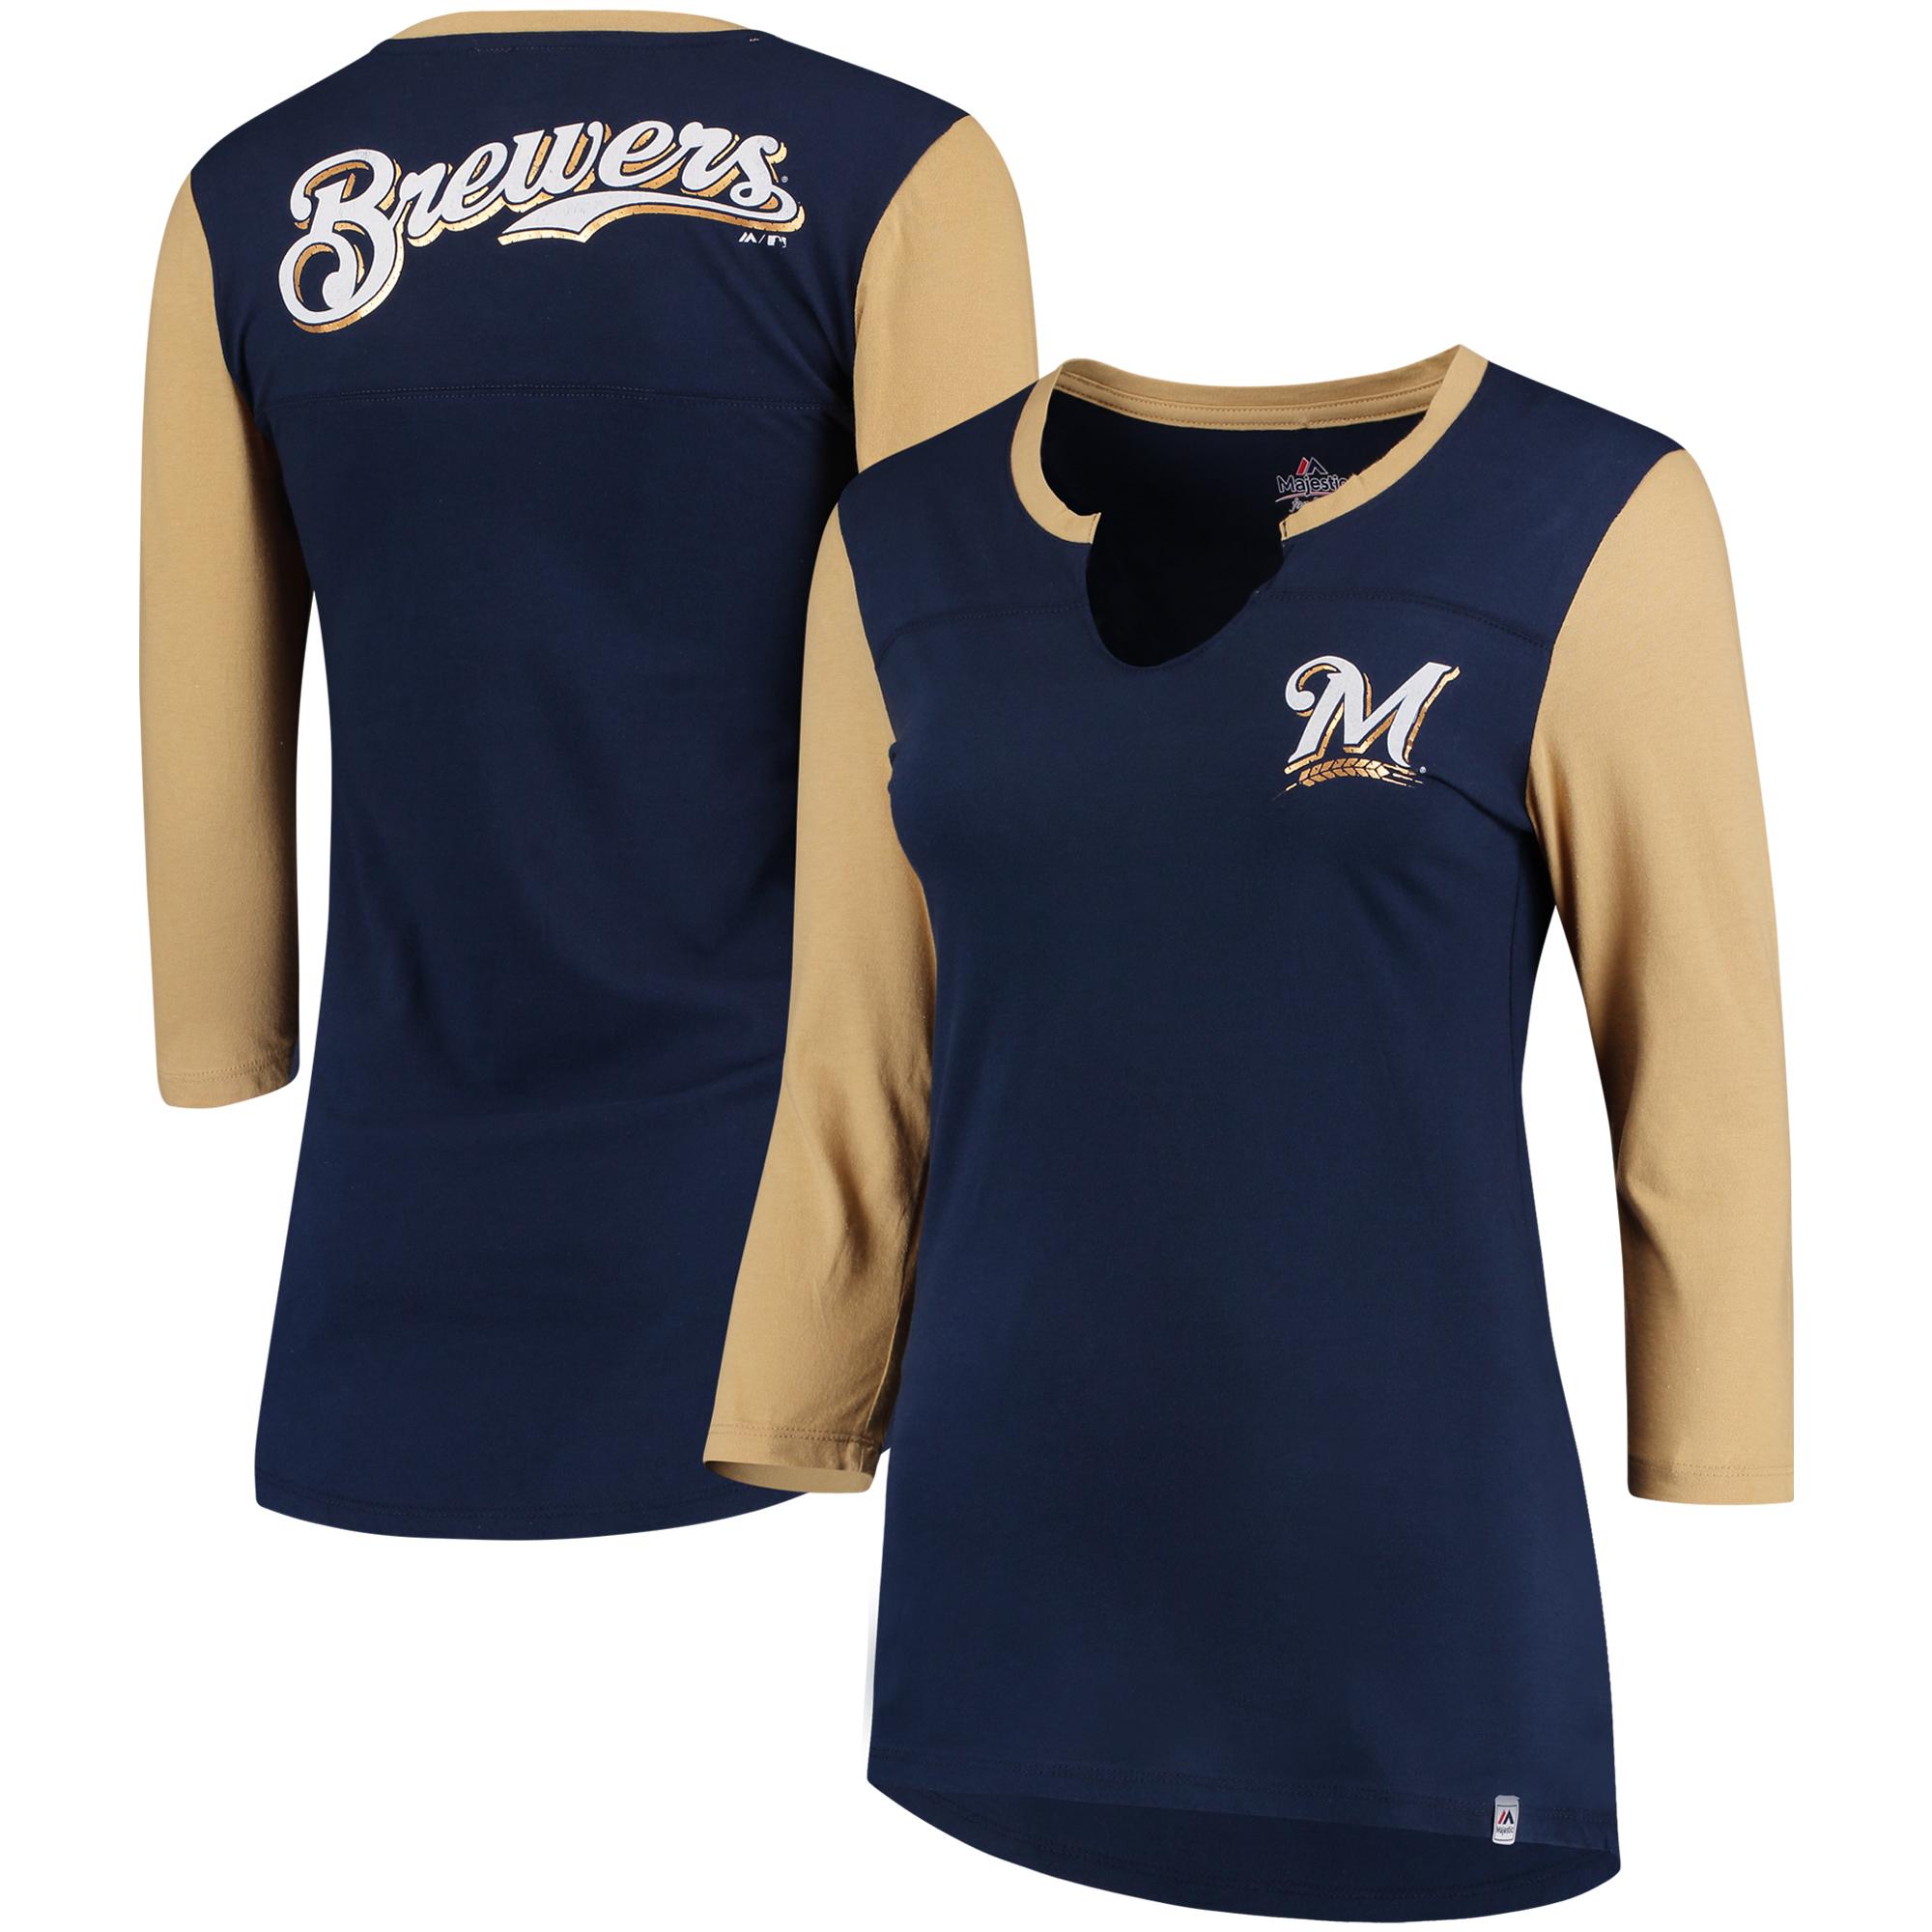 Milwaukee Brewers Majestic Women's Above Average Three-Quarter Sleeve V-Notch T-Shirt - Navy/Gold